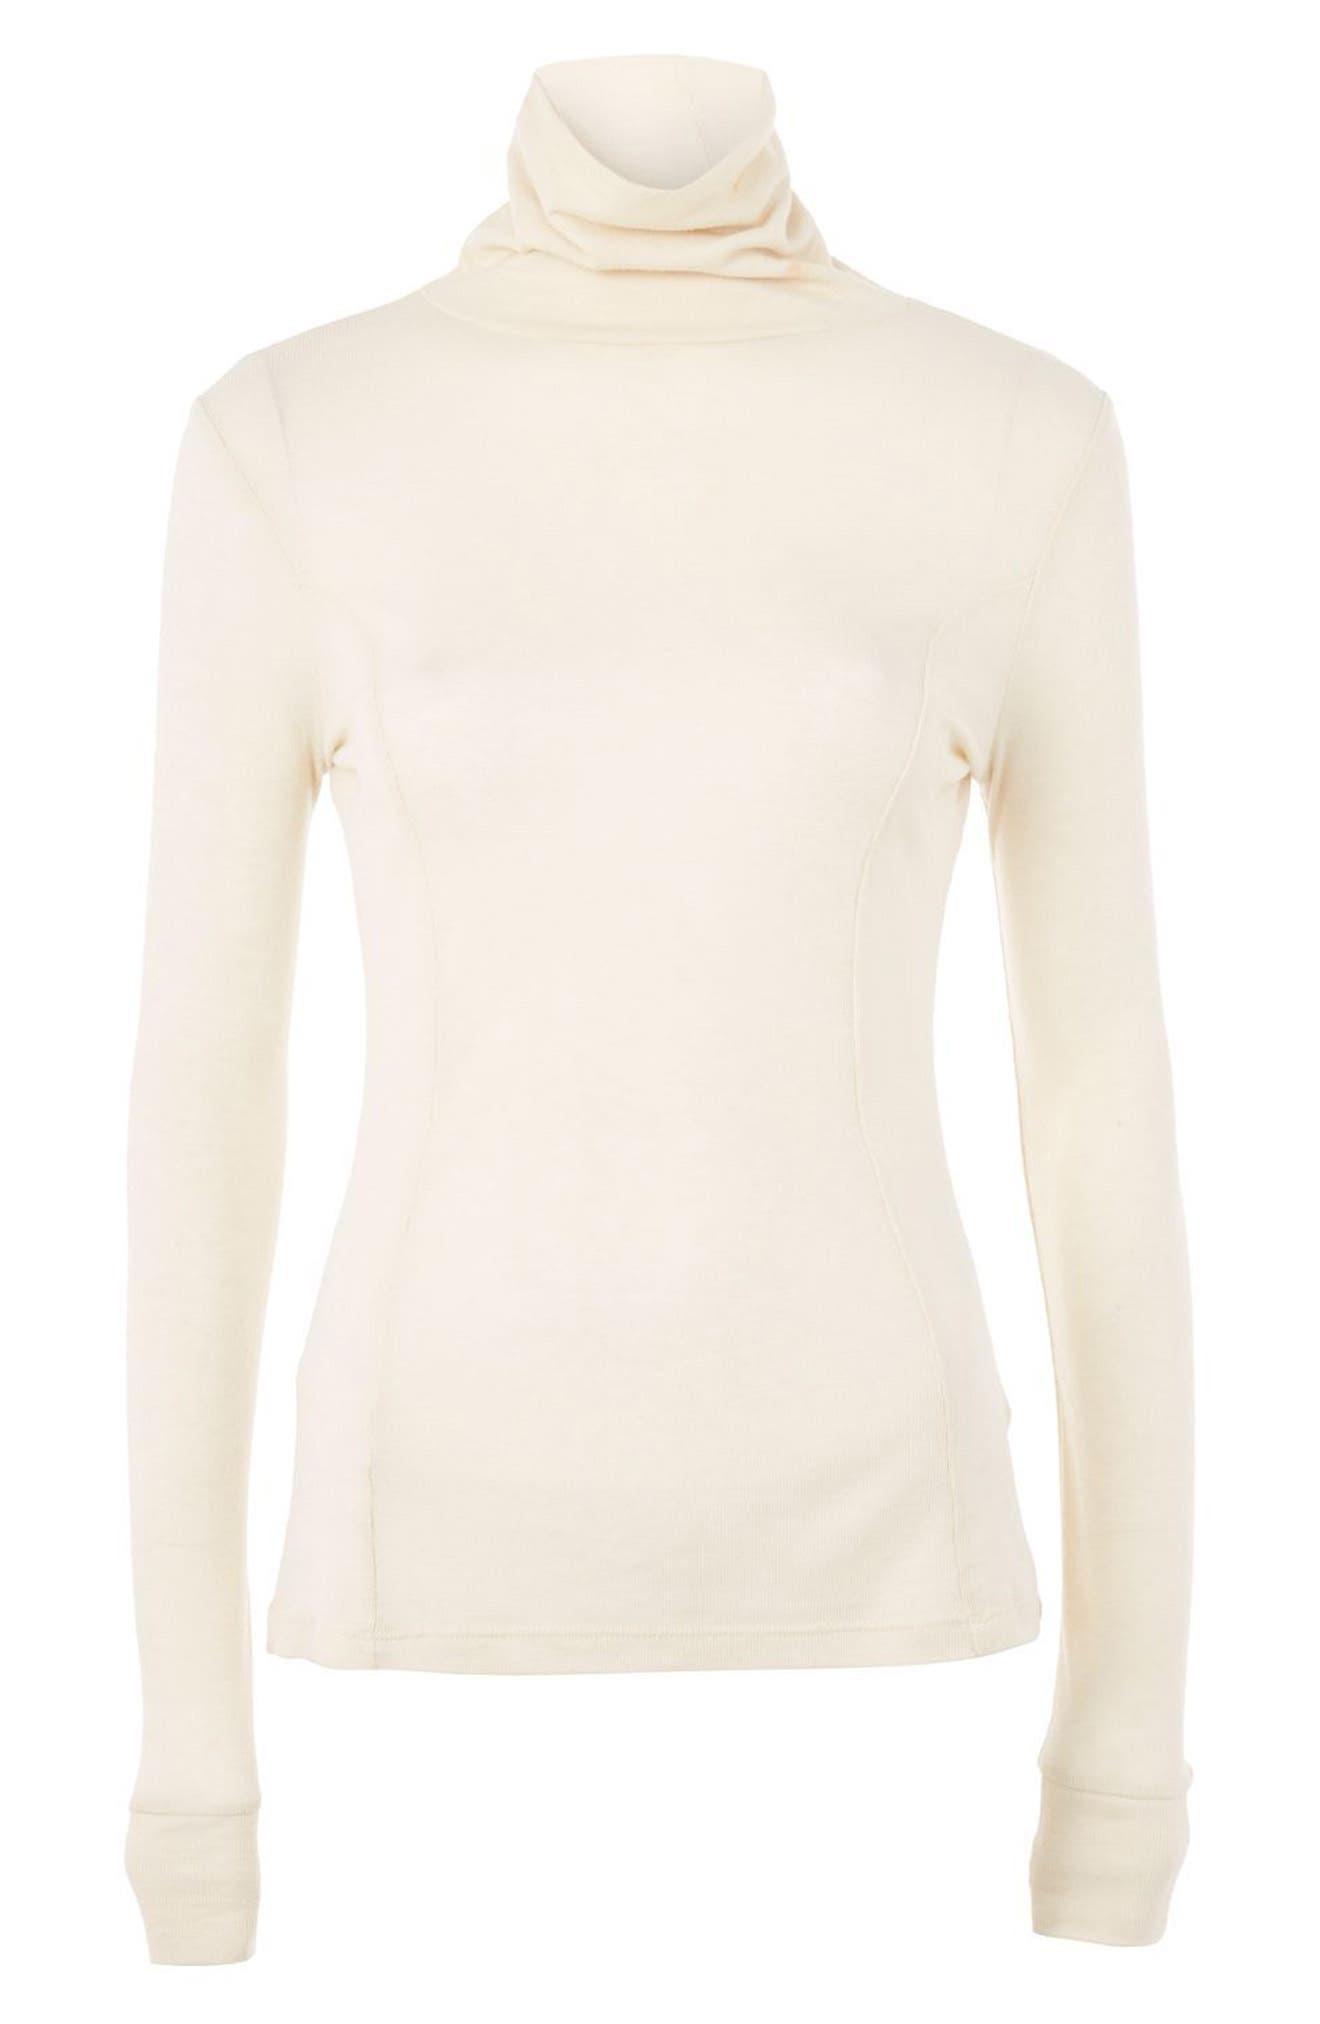 Wool Turtleneck Sweater,                         Main,                         color, Cream